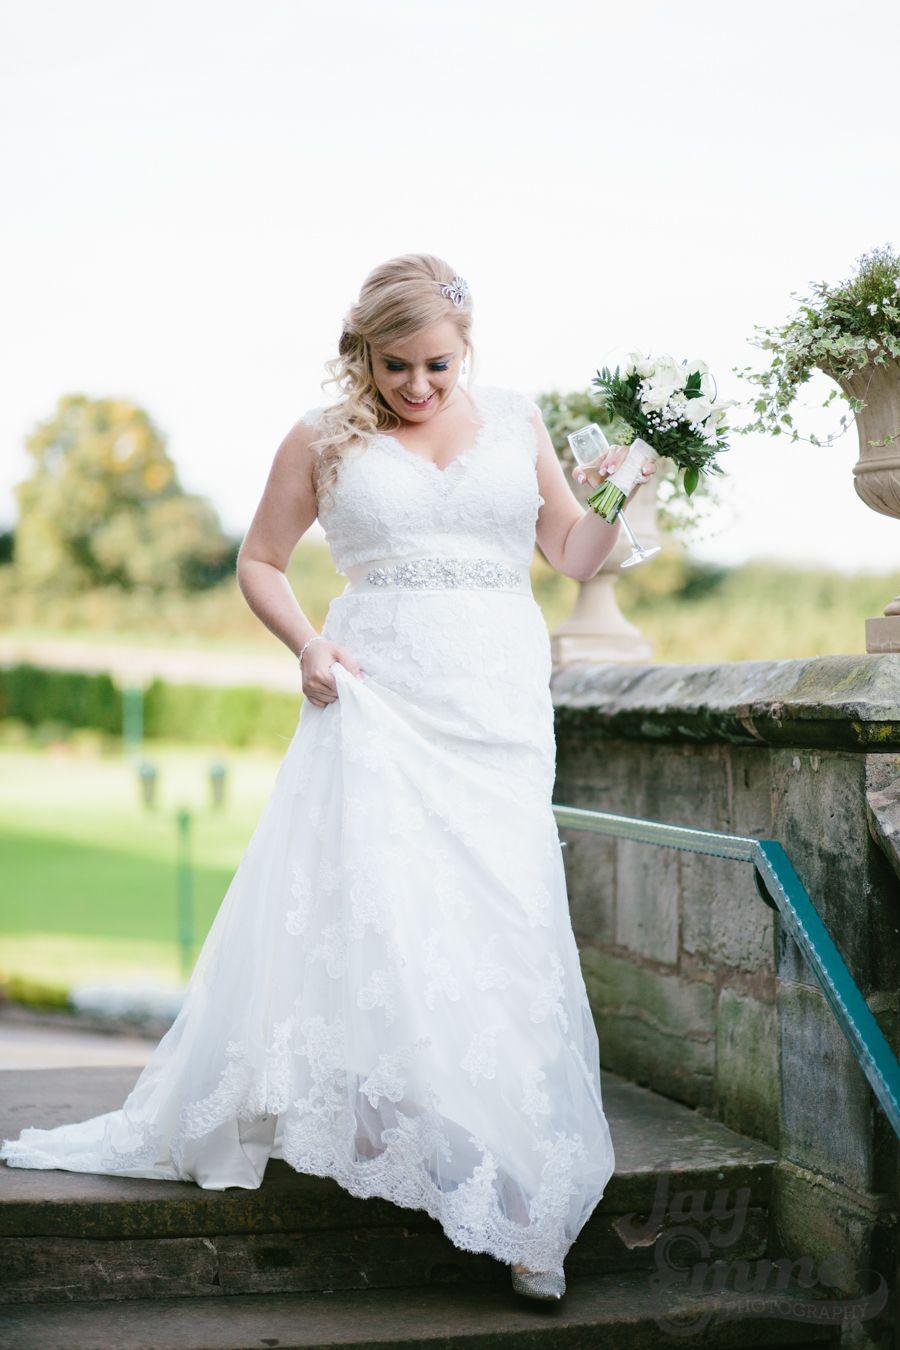 Weston Hall Wedding of Lisa and Gavin, Staffordshire Wedding ...